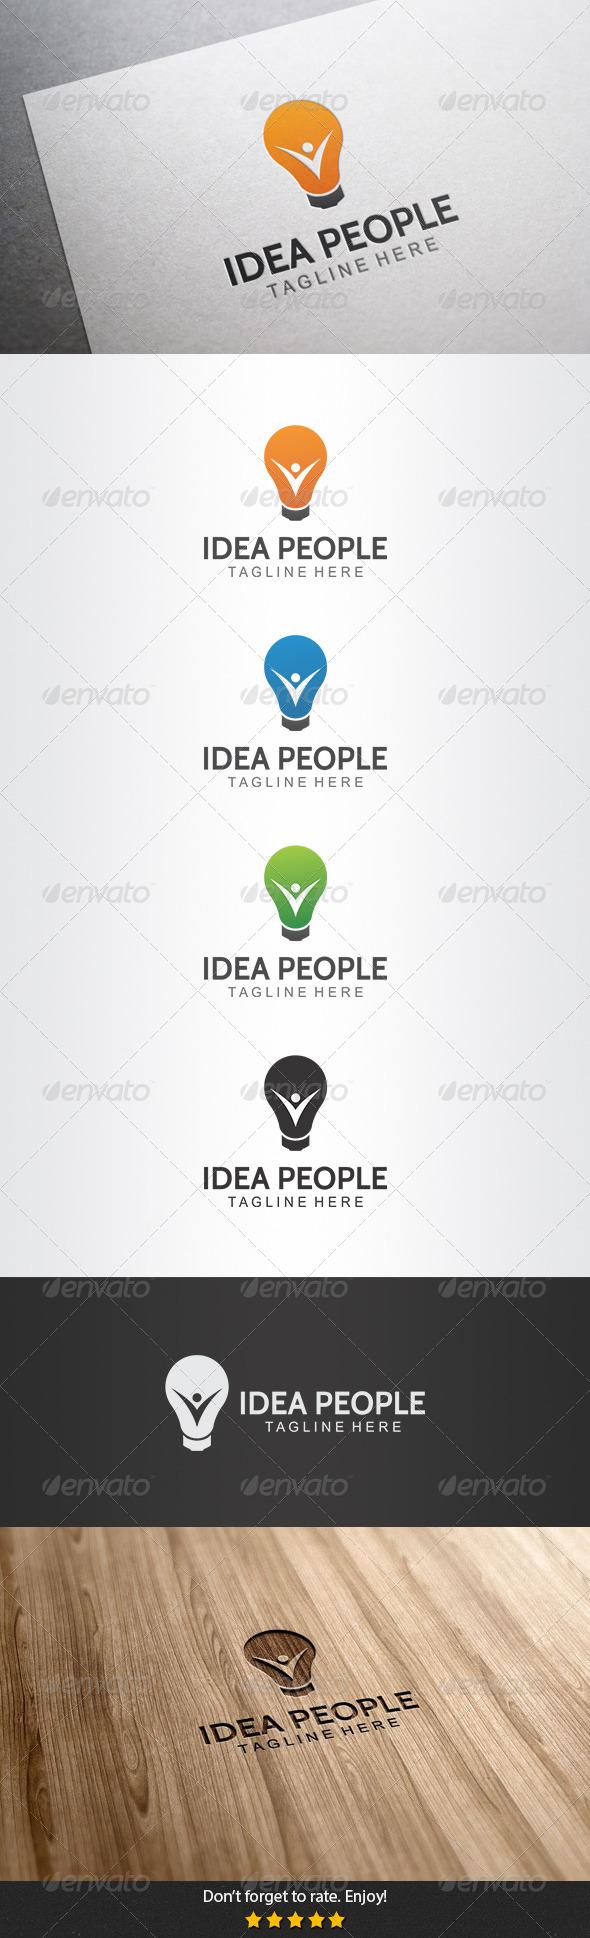 GraphicRiver Idea People Logo 5506914